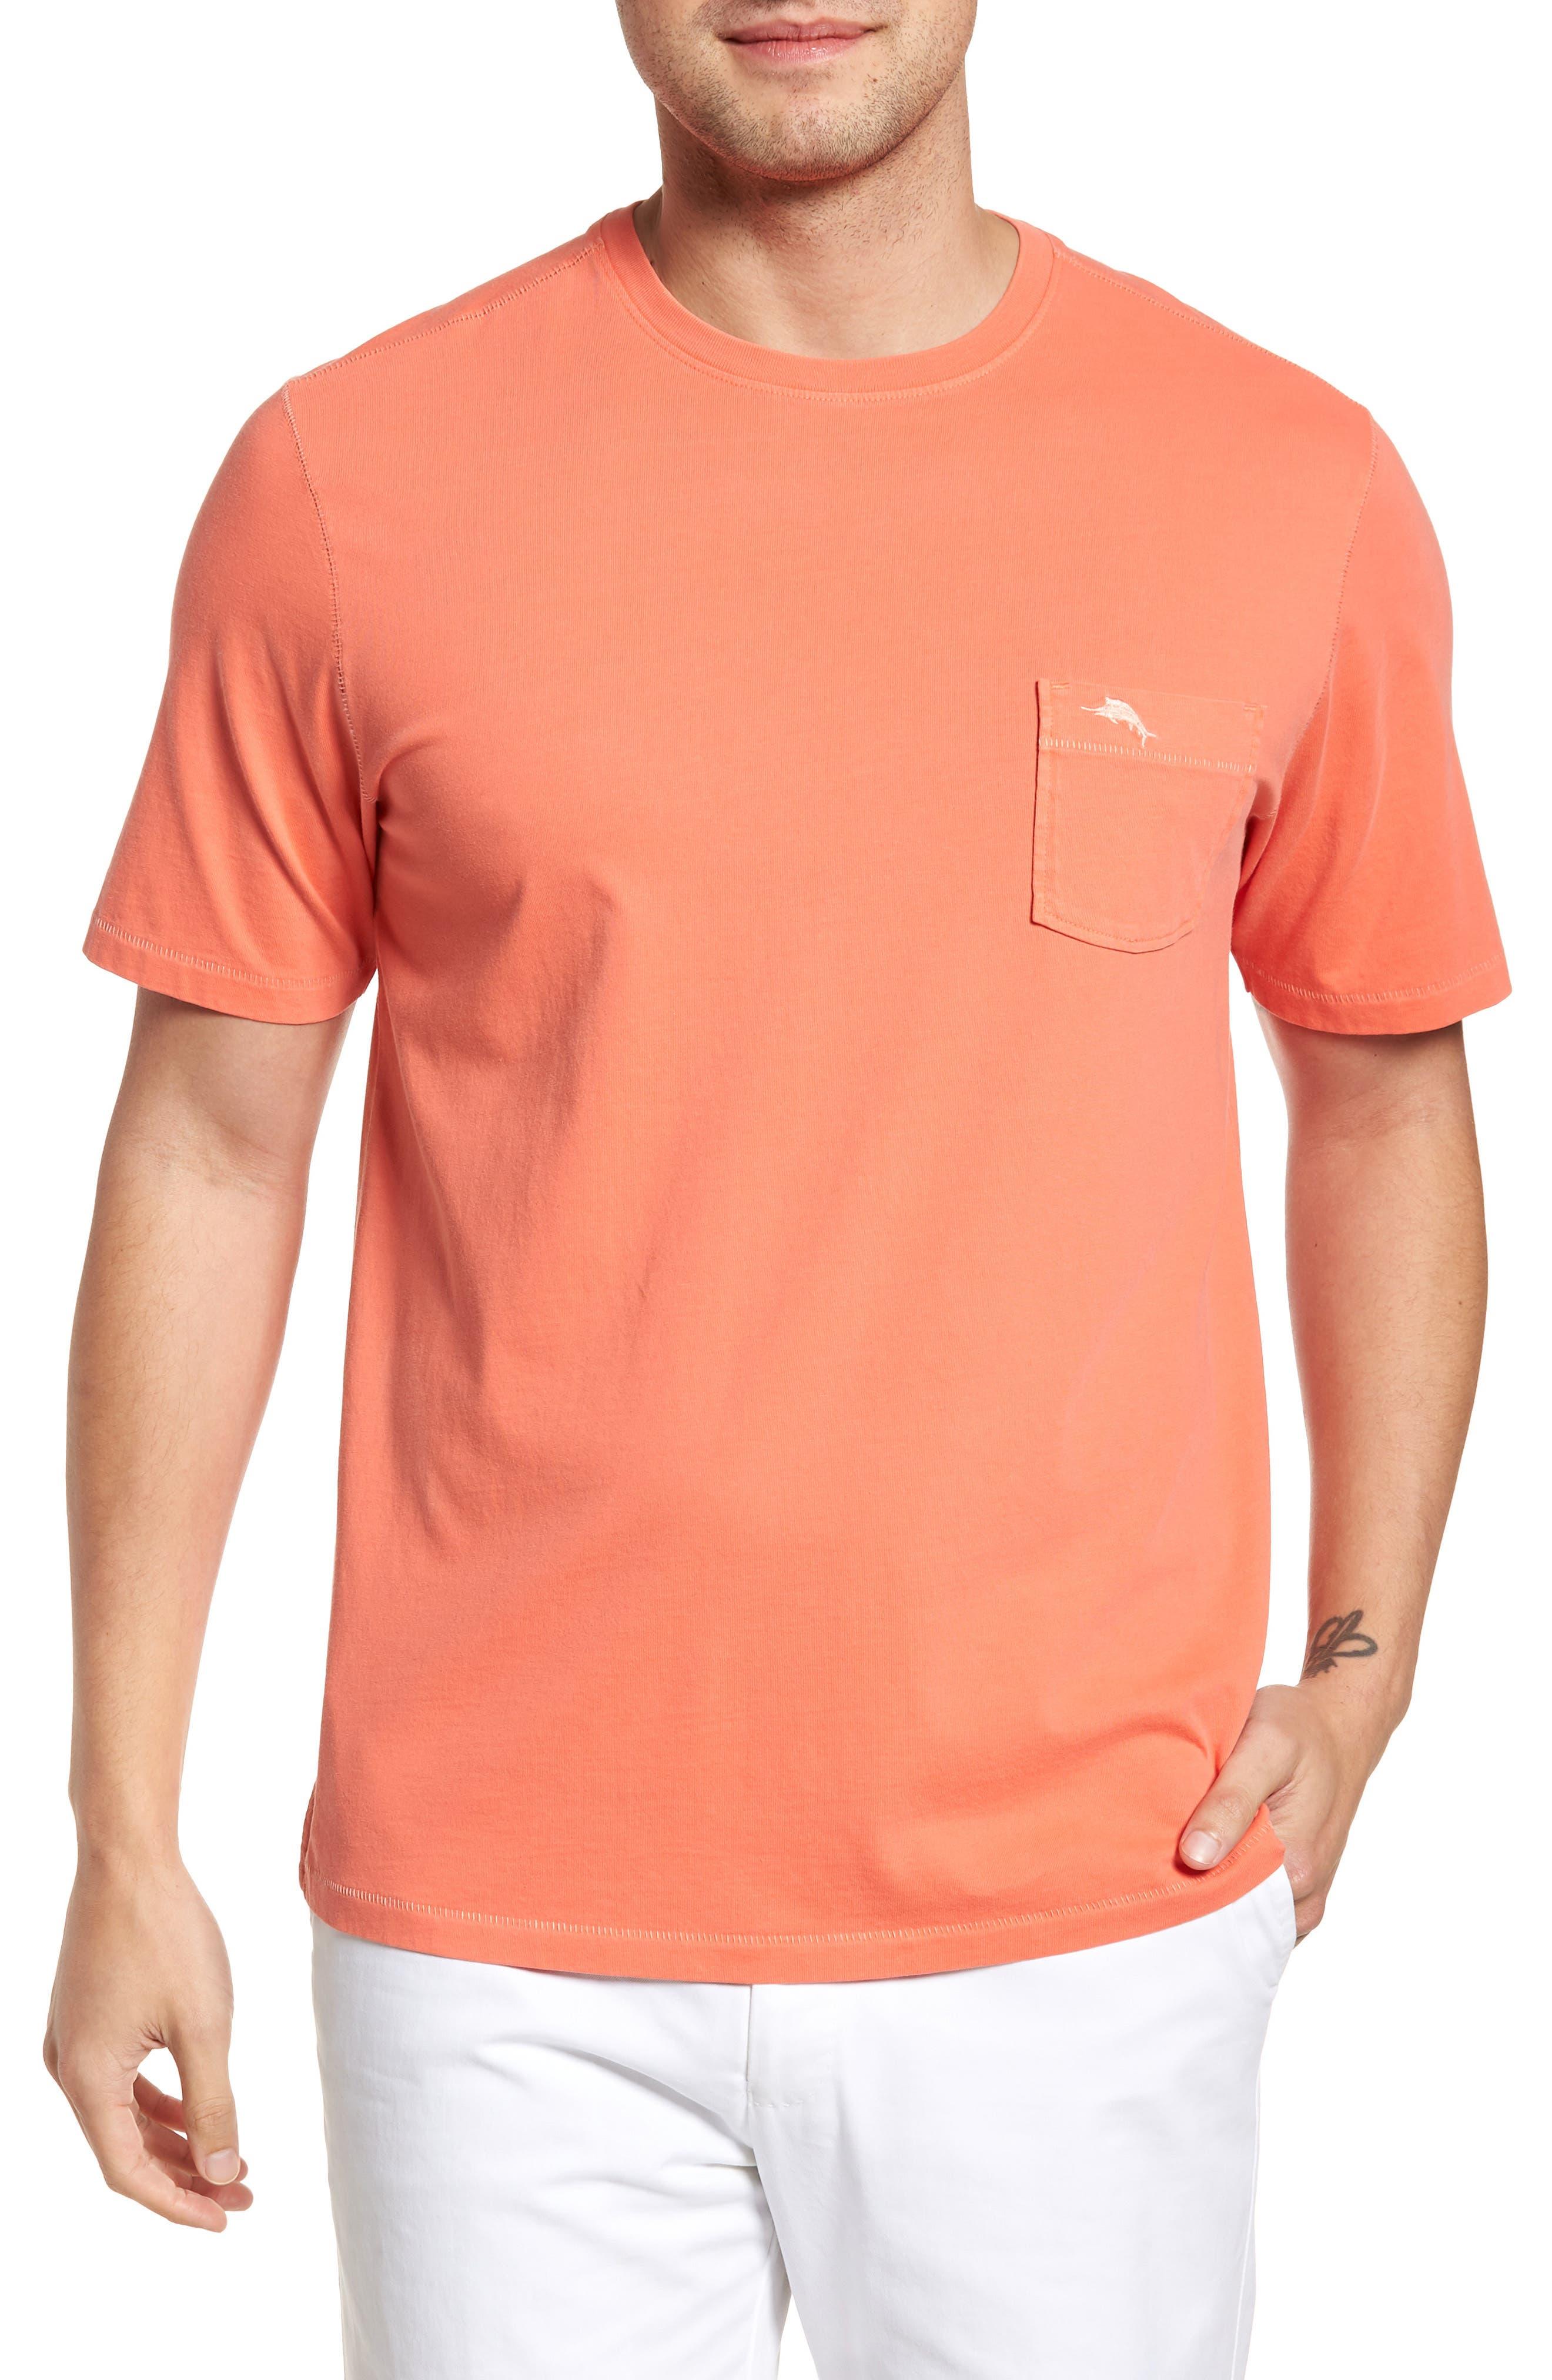 Main Image - Tommy Bahama 'New Bahama Reef' Island Modern Fit Pima Cotton Pocket T-Shirt